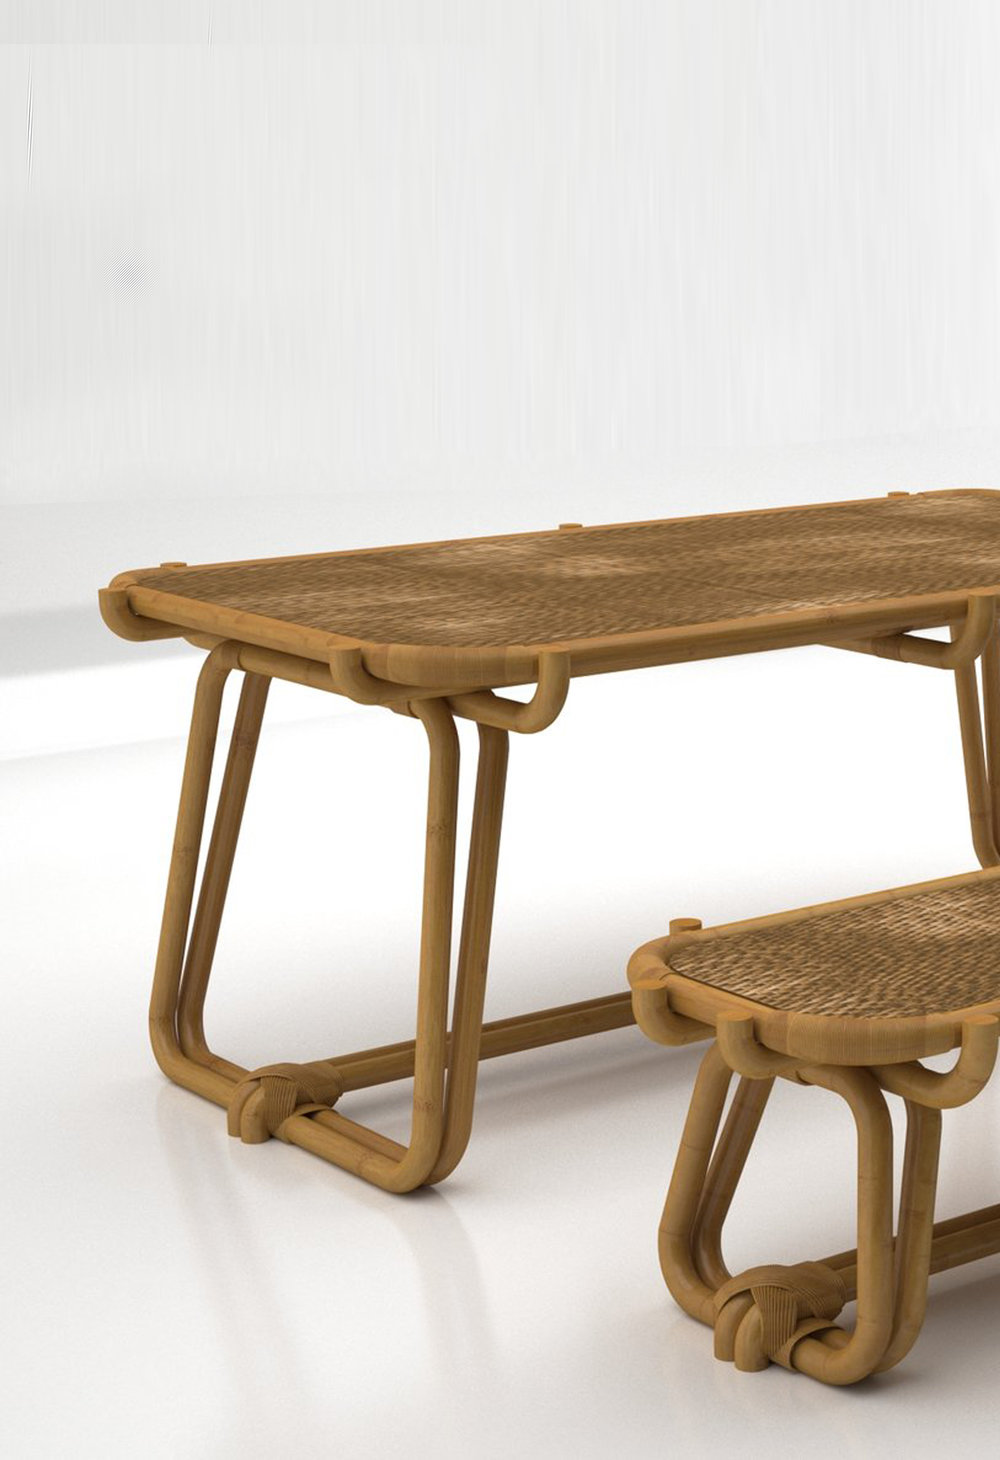 rattan_table_bench_01.jpg